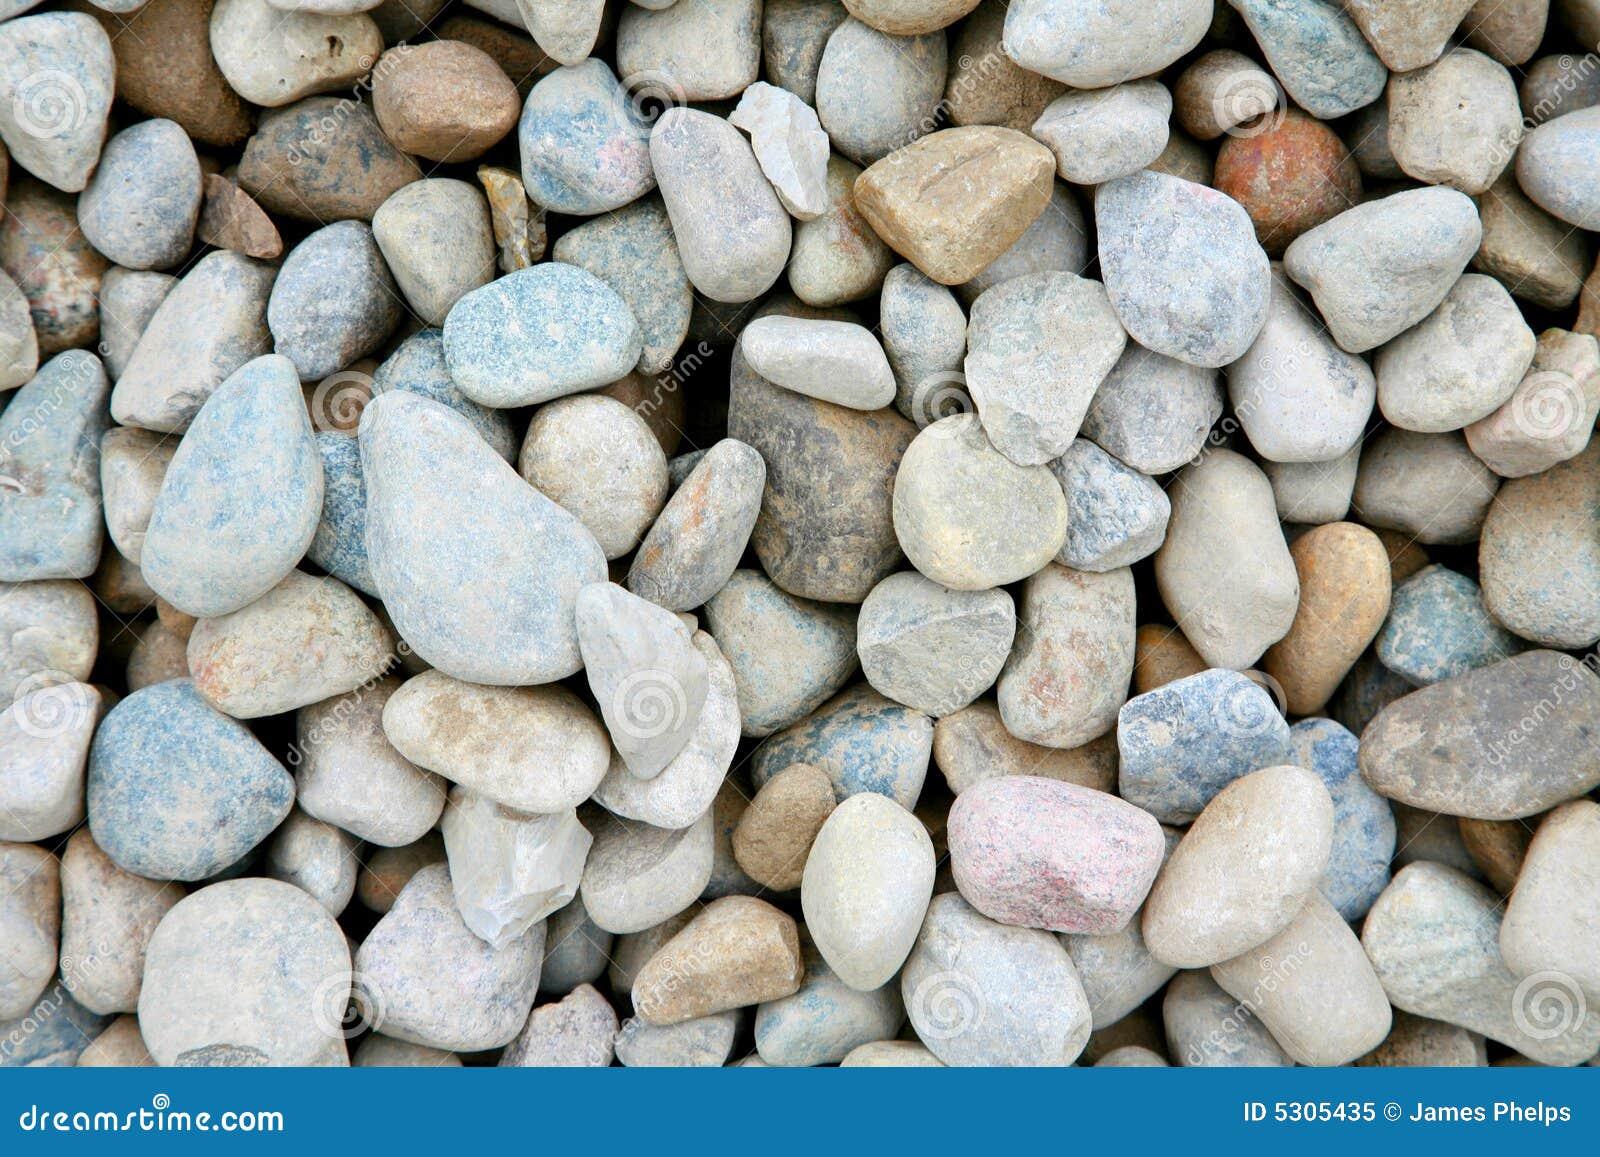 river rock stones royalty free stock photo image 5305435. Black Bedroom Furniture Sets. Home Design Ideas